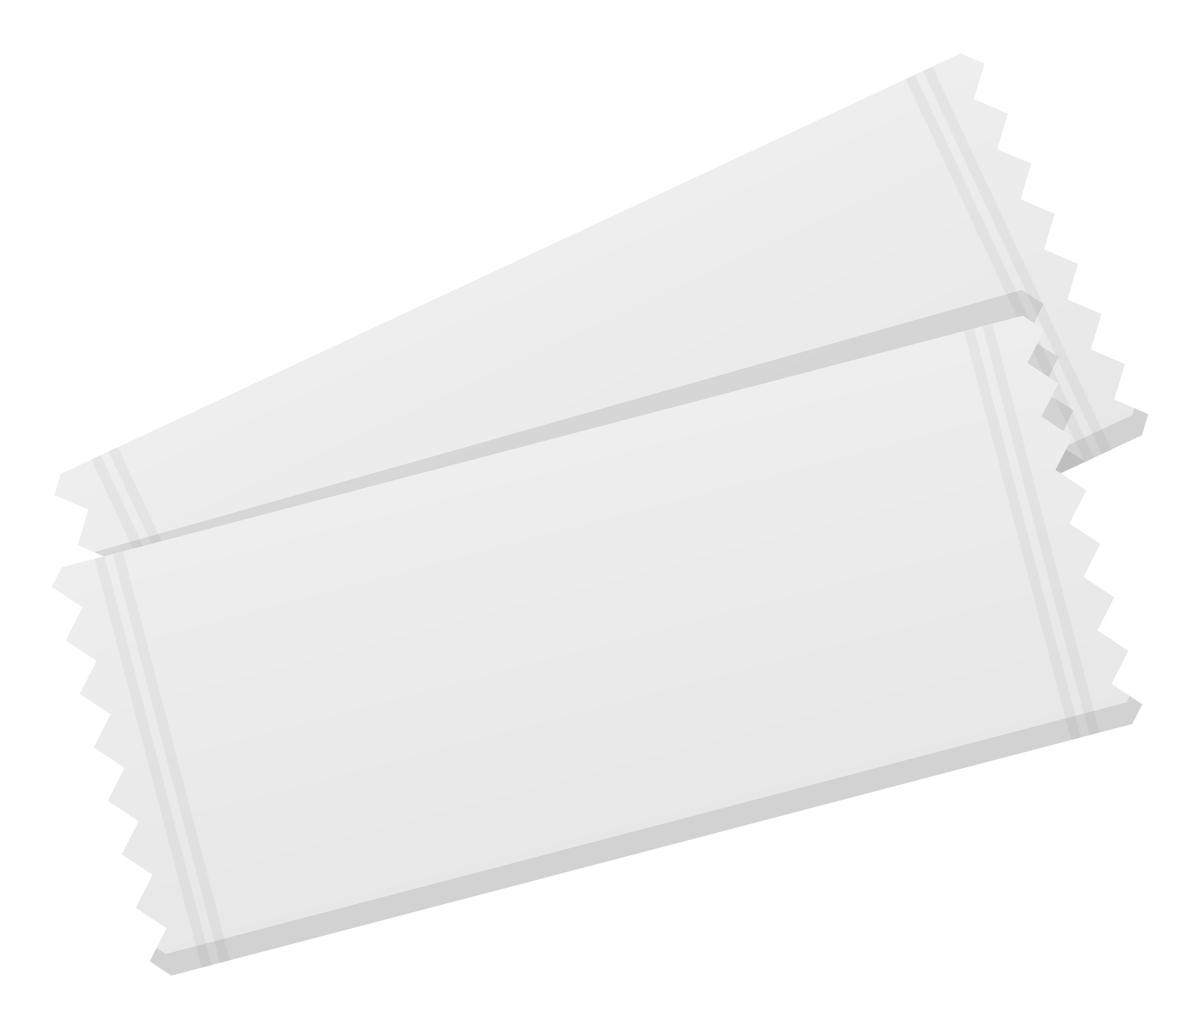 f:id:tamaminao:20210124103735j:plain